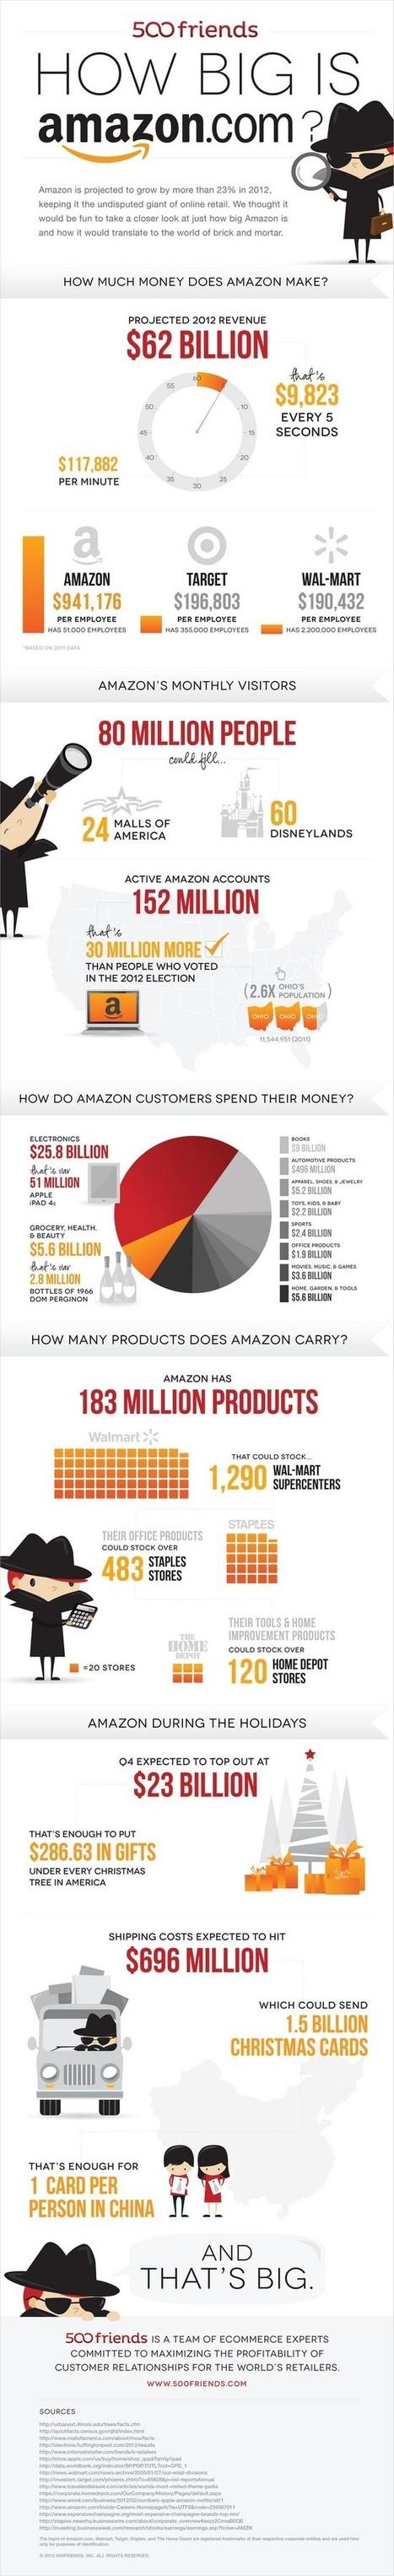 How big is Amazon.com? [Infographic] | Company Newscrawl: Amazon | Scoop.it